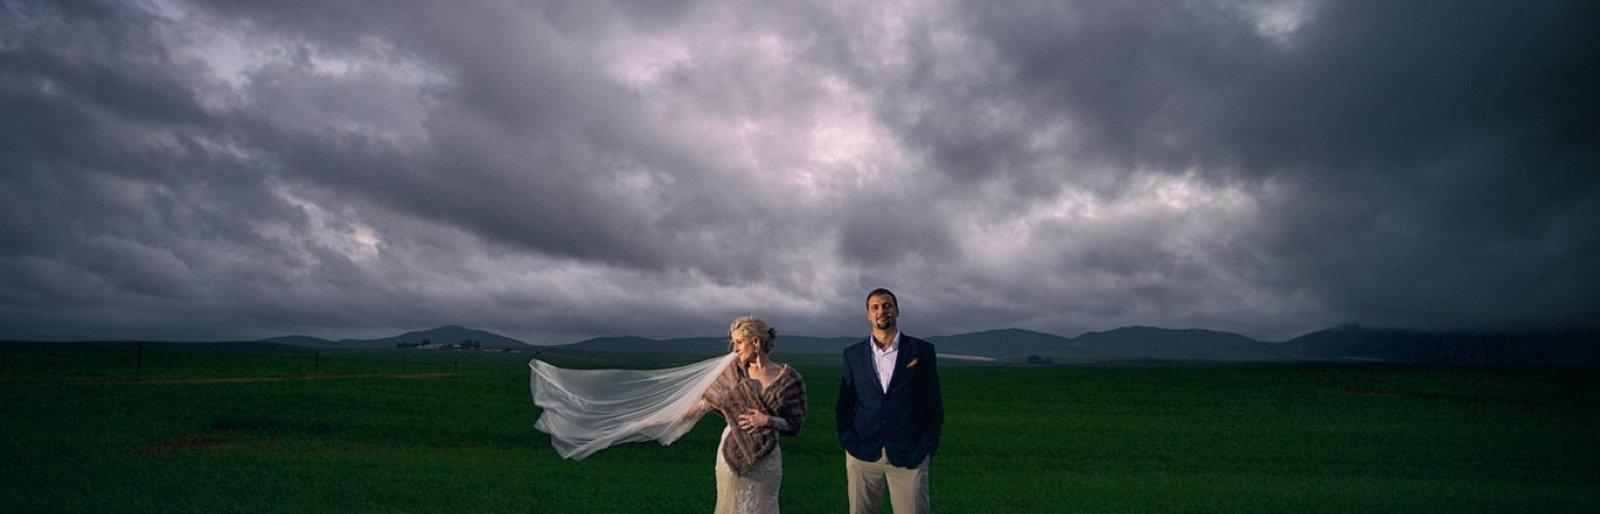 Delsma Farm Wedding Special